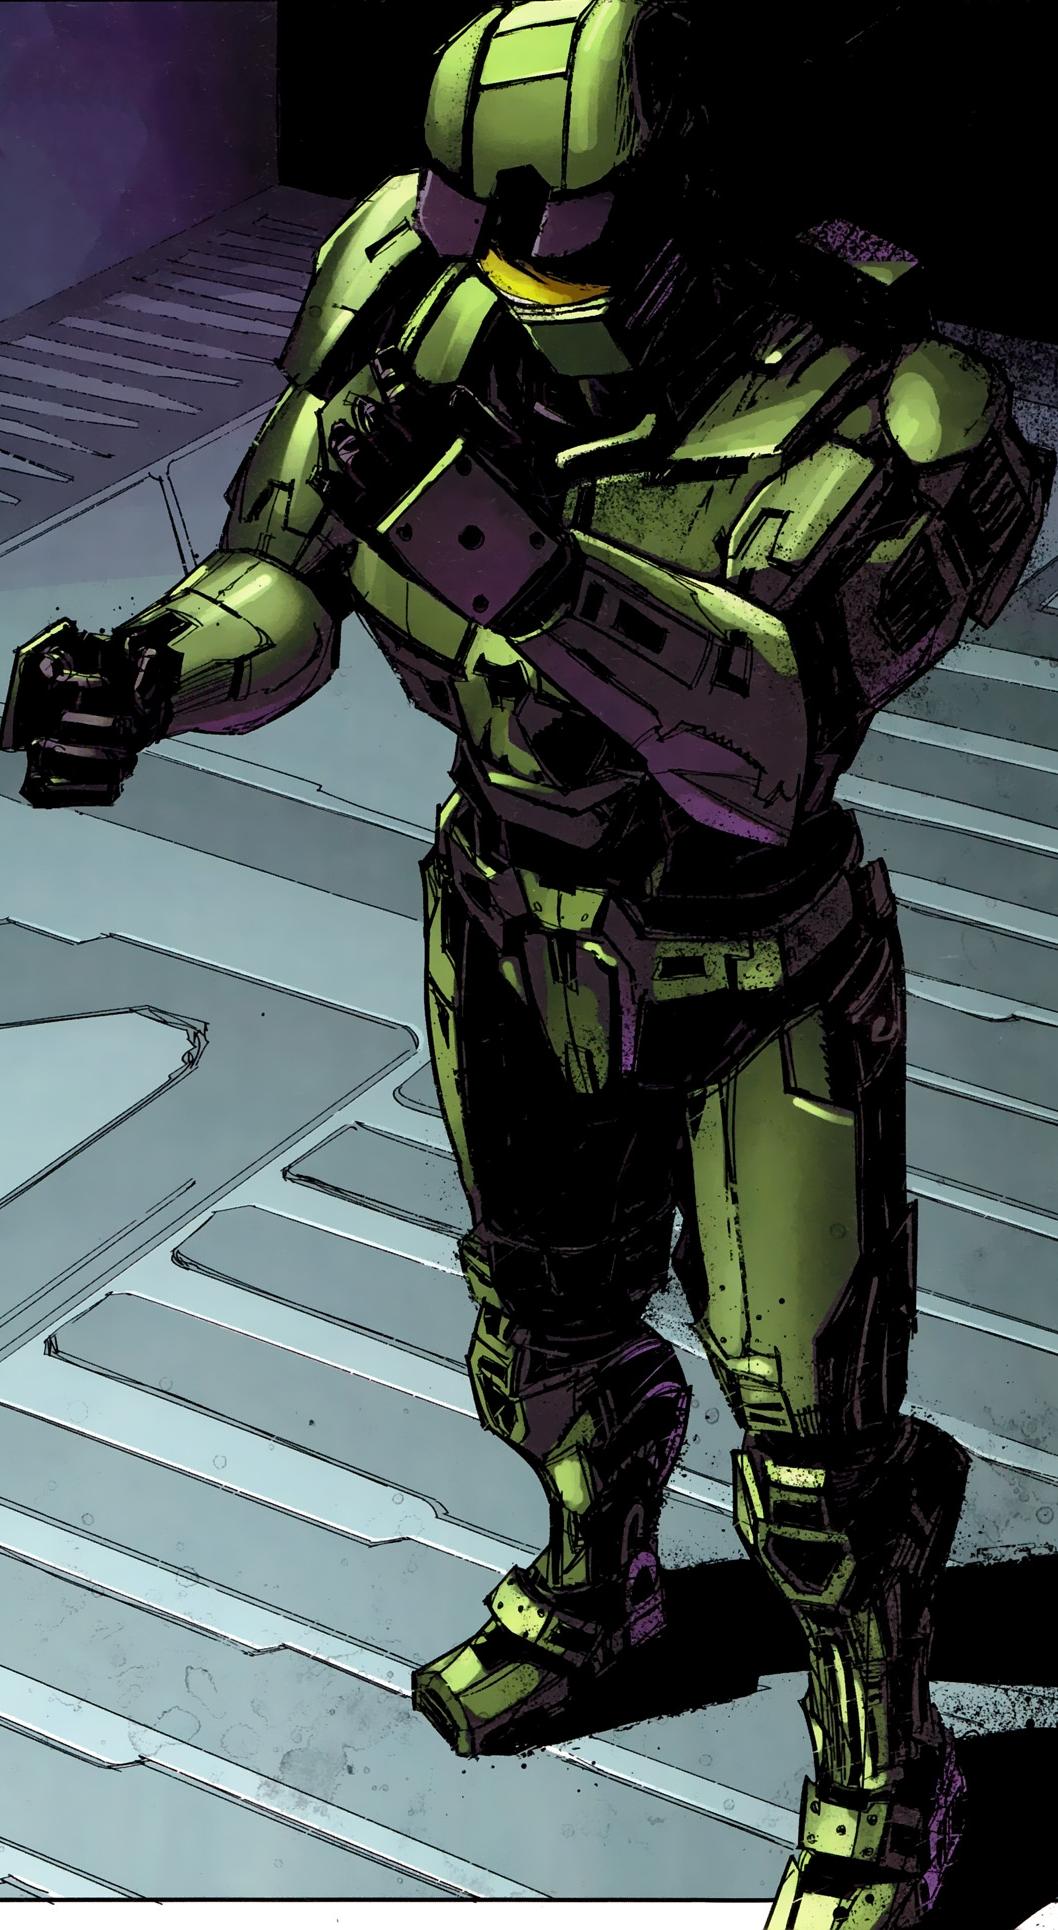 Halo Reach Armor Customizer Halo Reach Armor Vanity